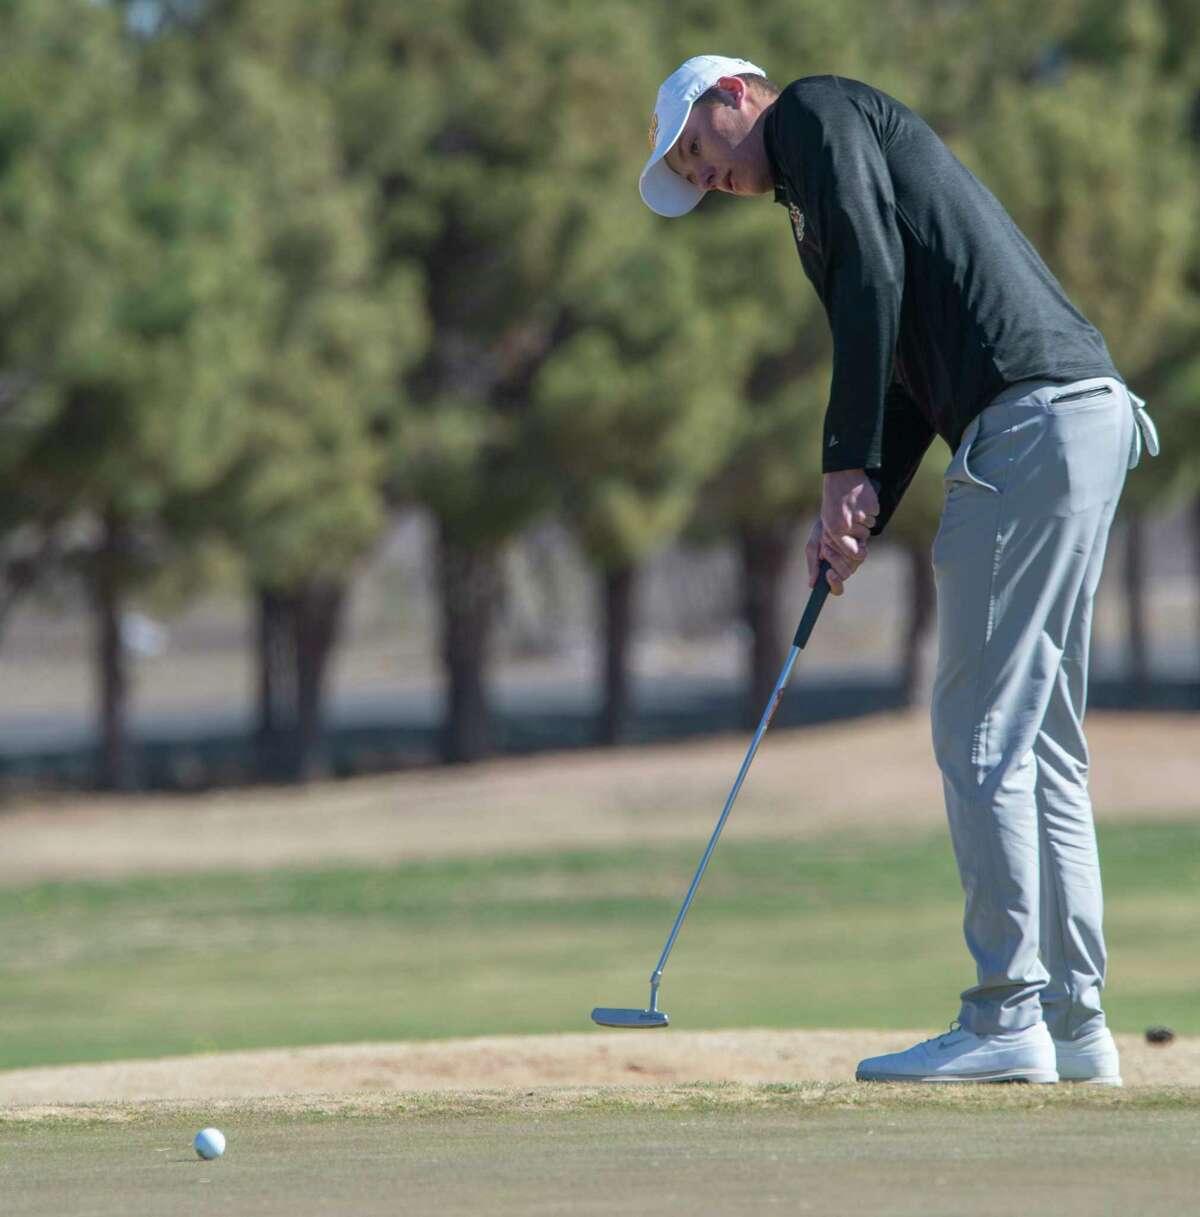 Midland College's Adam Coull follows his putt 03/02/2021 during the TankLogix Intercollegiate Golf Tournament at Ranchland Hills Golf Club. Tim Fischer/Reporter-Telegram